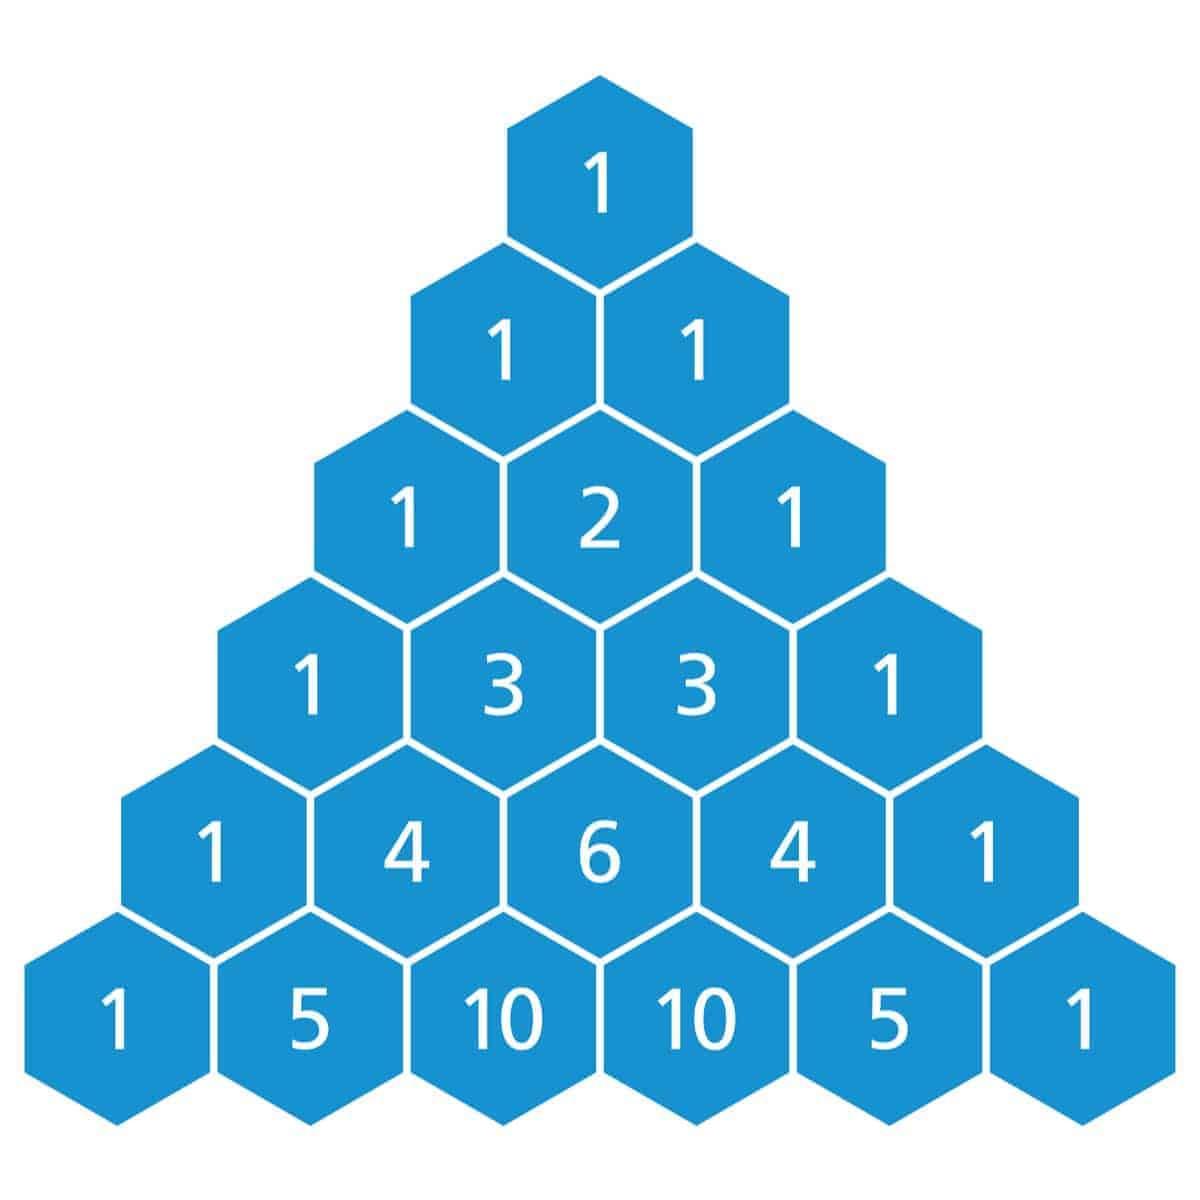 Blue-Colored Triangle